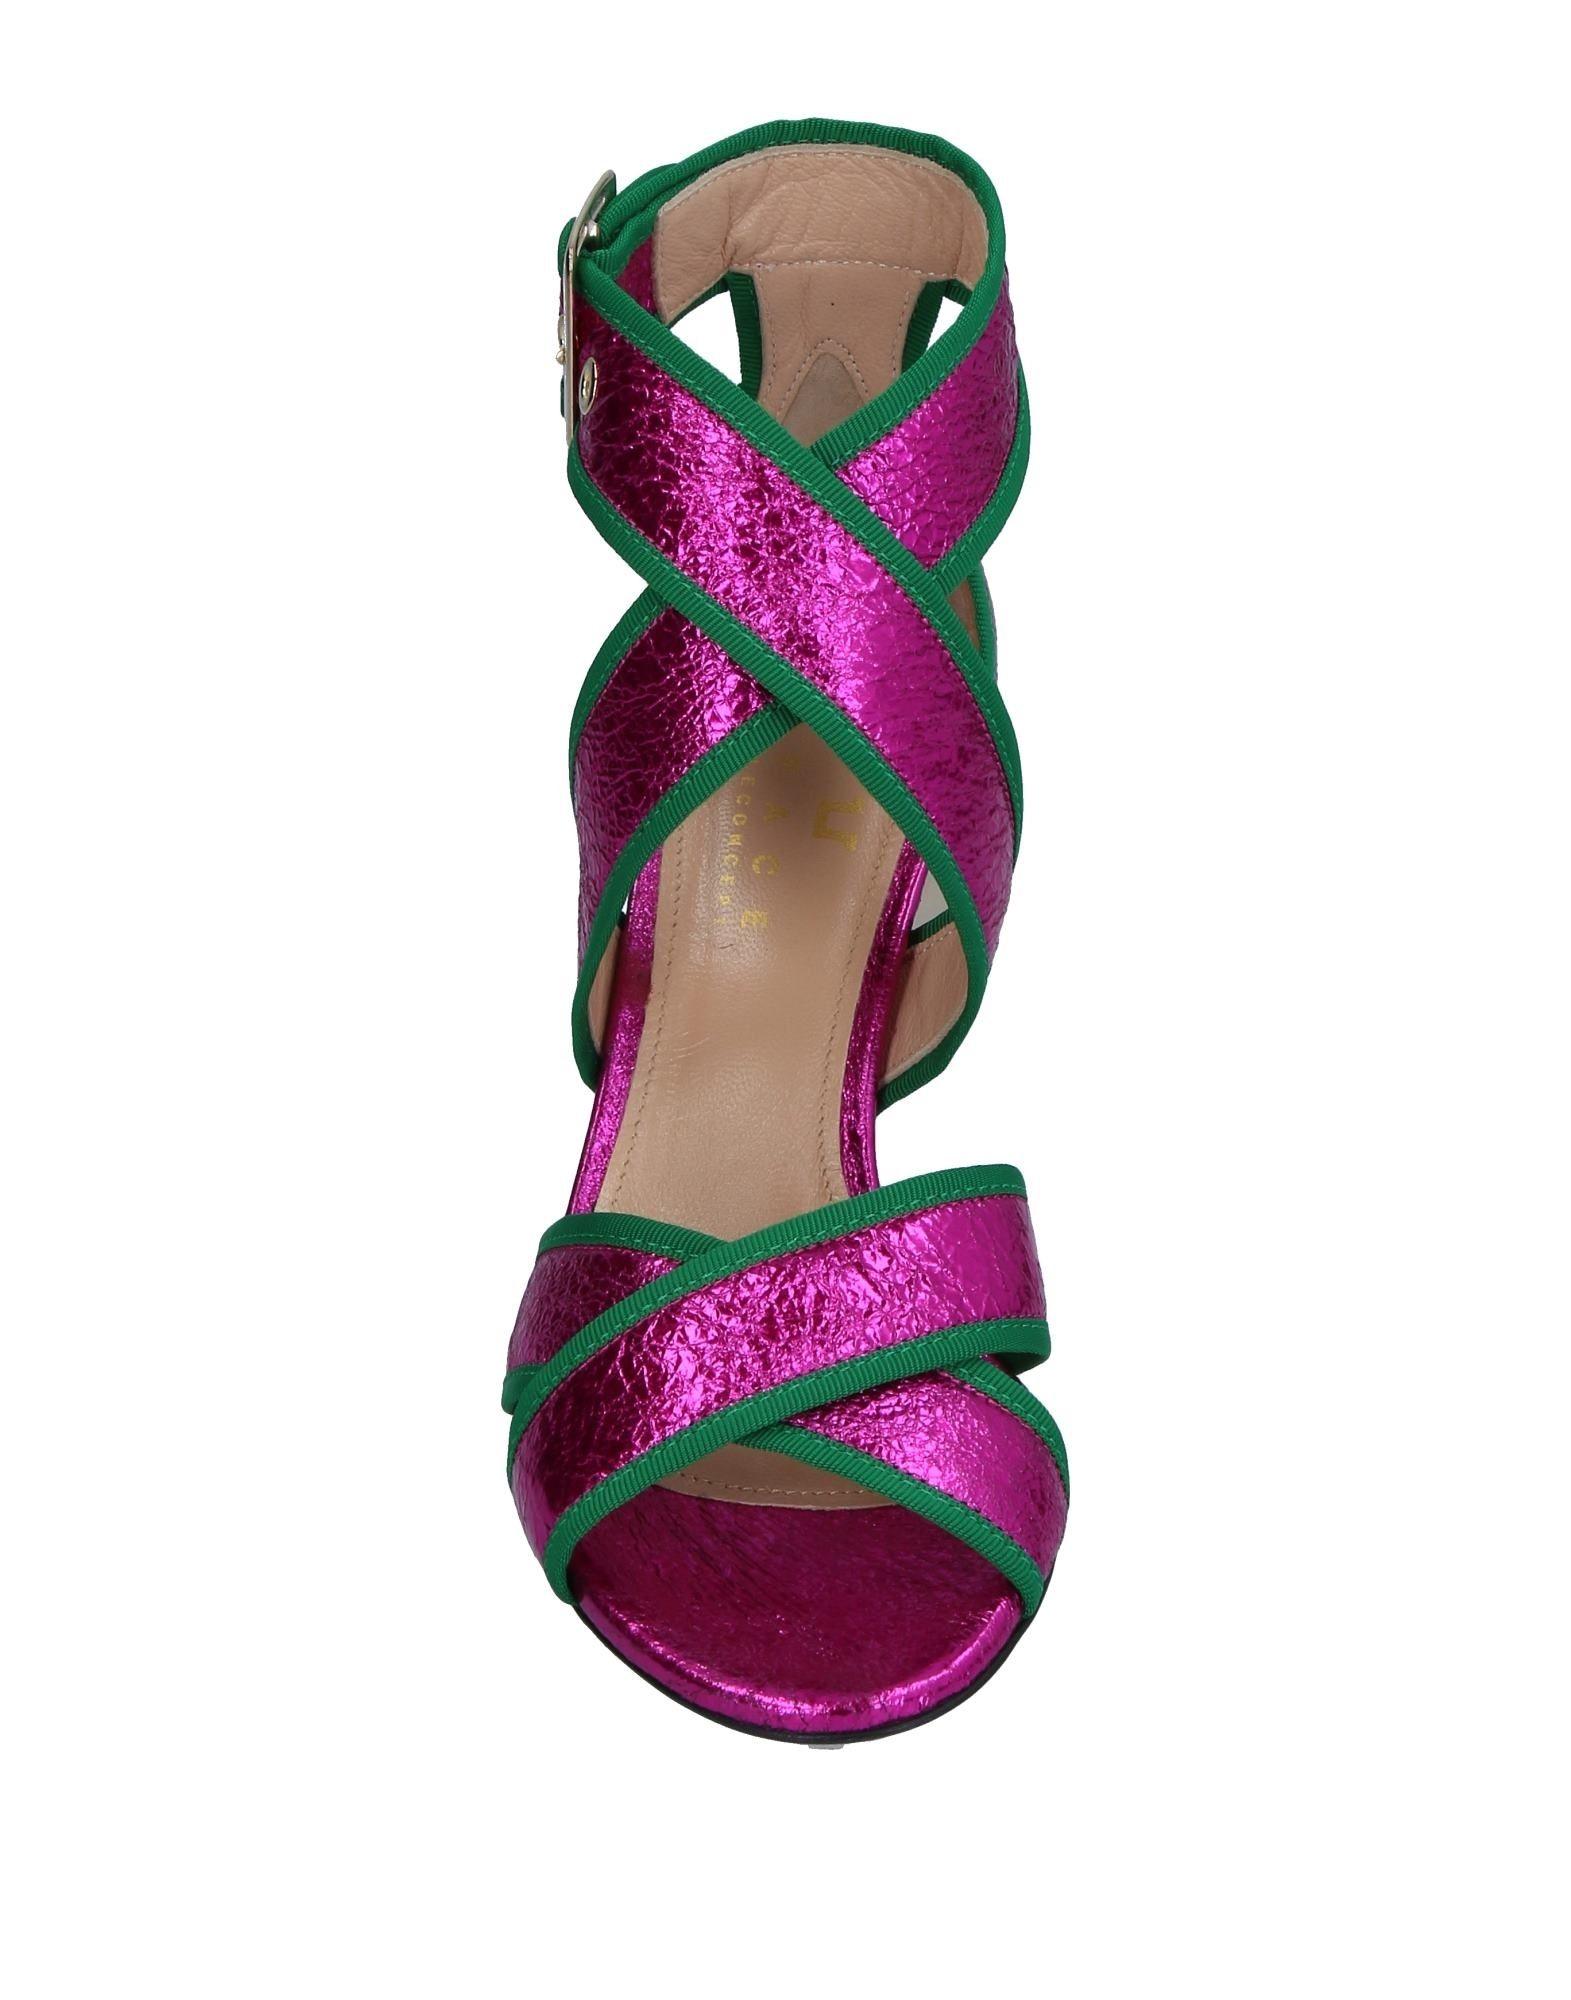 Stilvolle billige Sandalen Schuhe Space Style Concept Sandalen billige Damen  11335902KQ 3e33bd